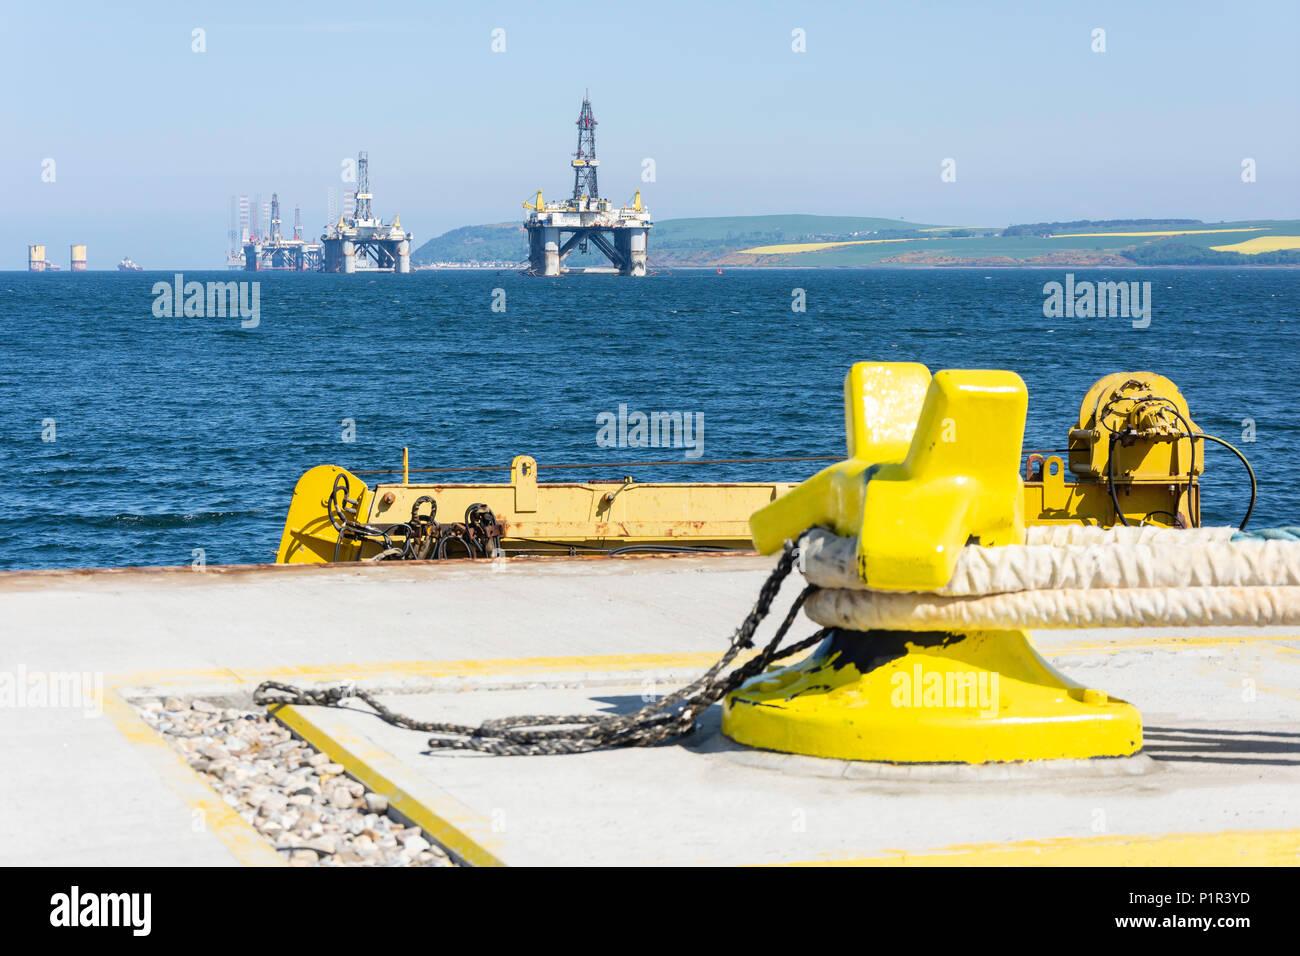 Oil rigs anchoured in the Cromarty Firth, Invergordon, Highland, Scotland, United Kingdom - Stock Image